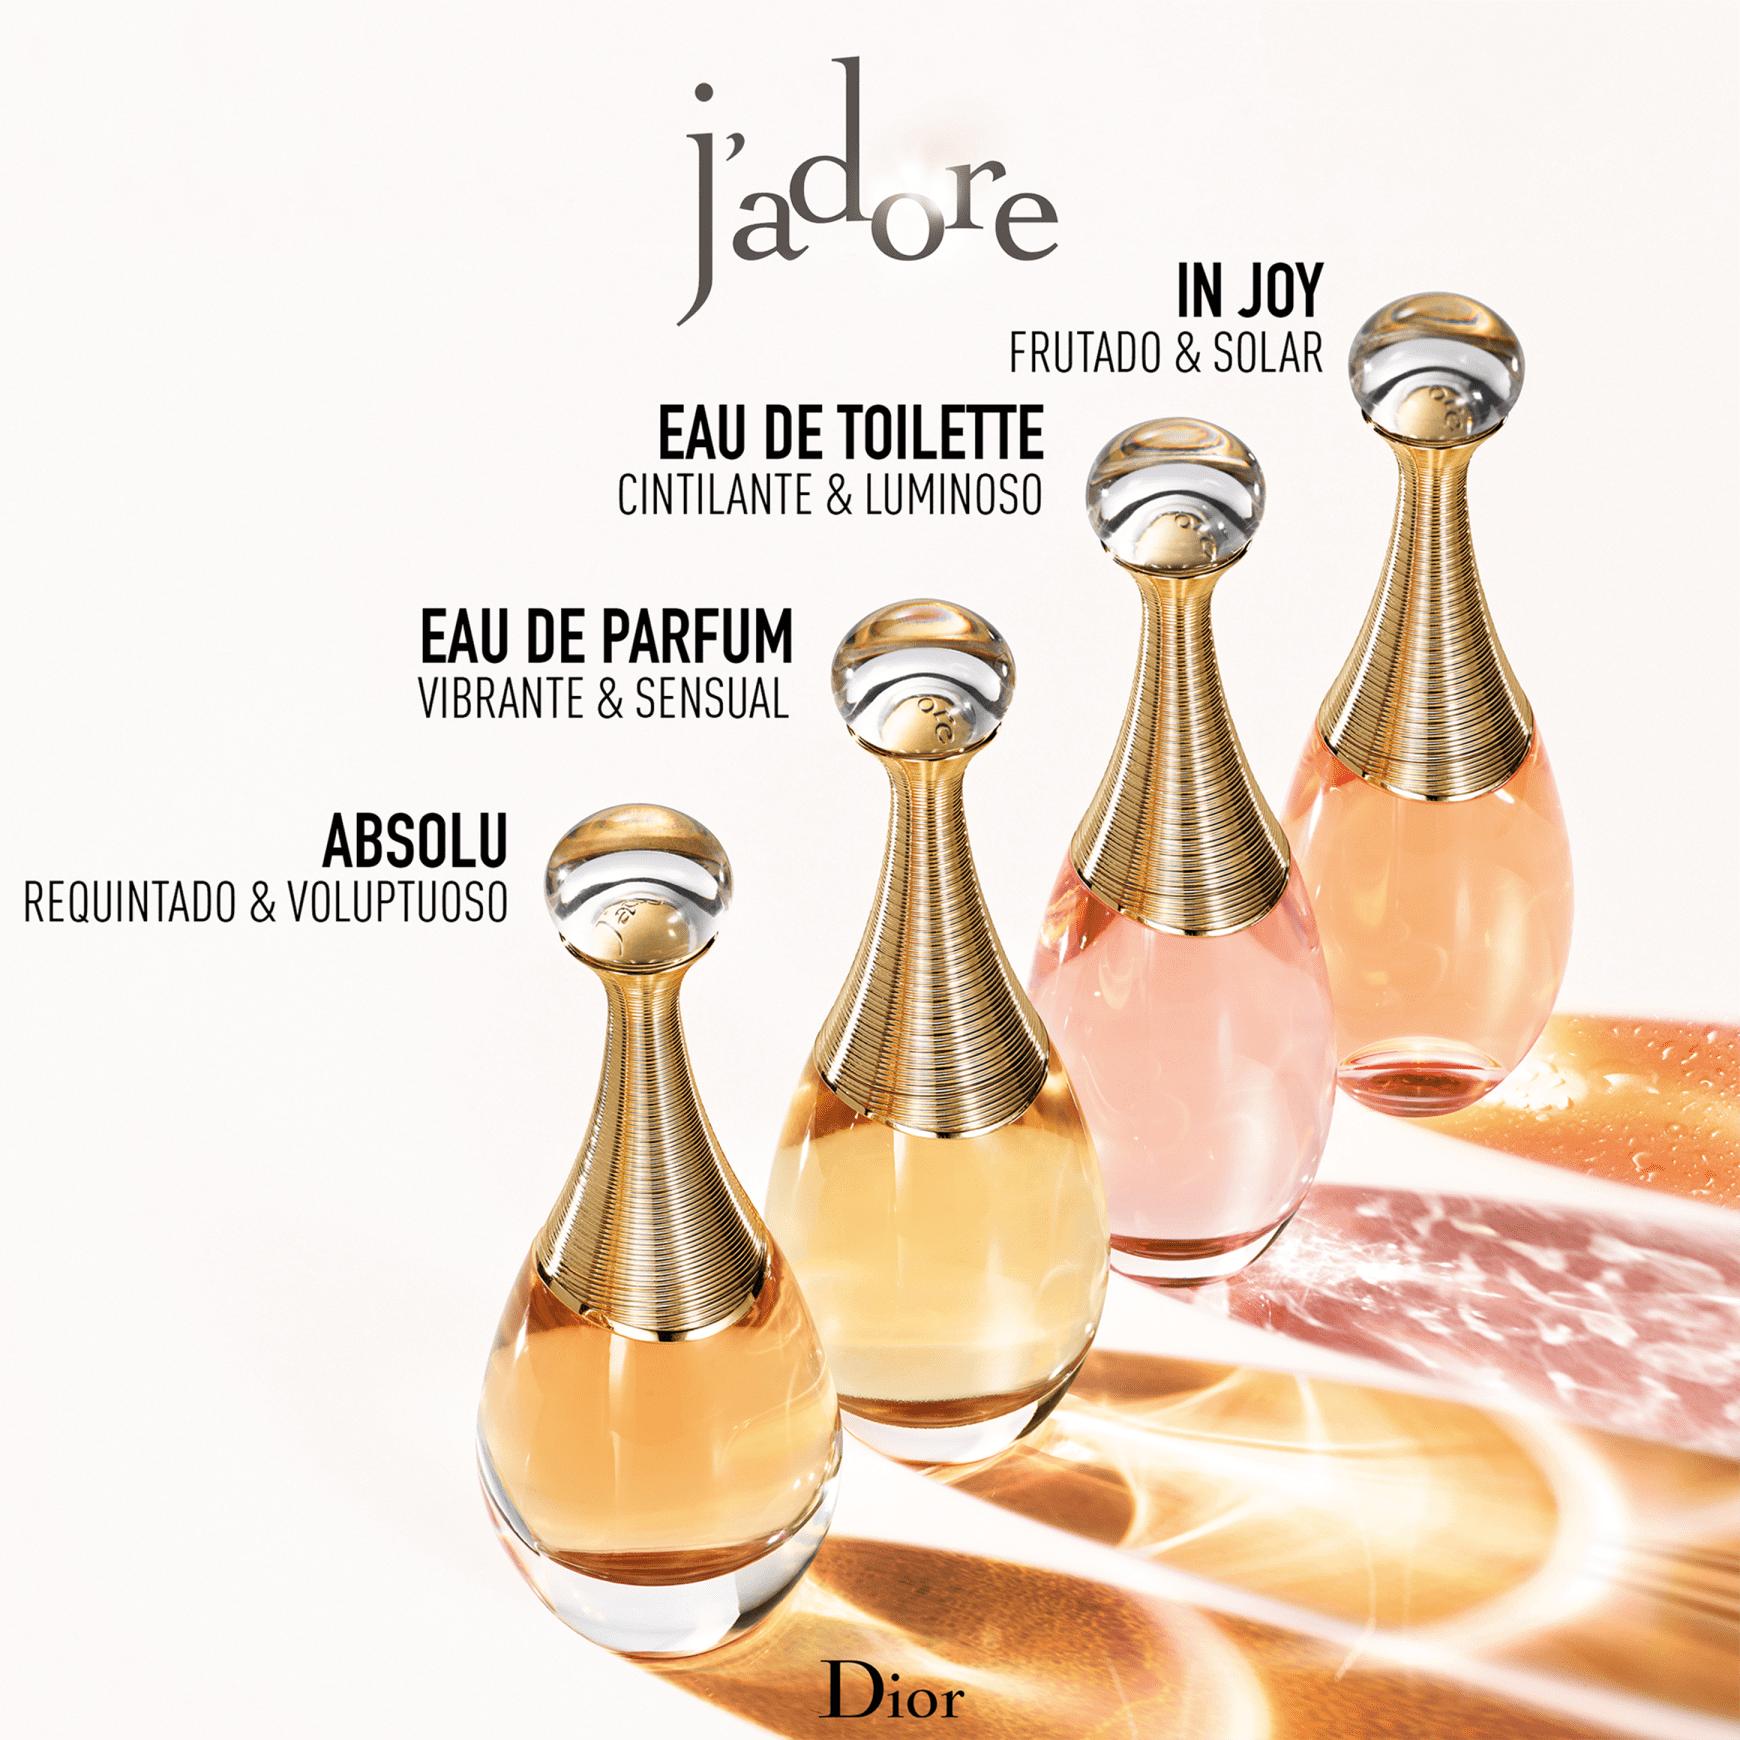 01d57567b93 J adore Dior Eau de Parfum - Perfume Feminino 100ml